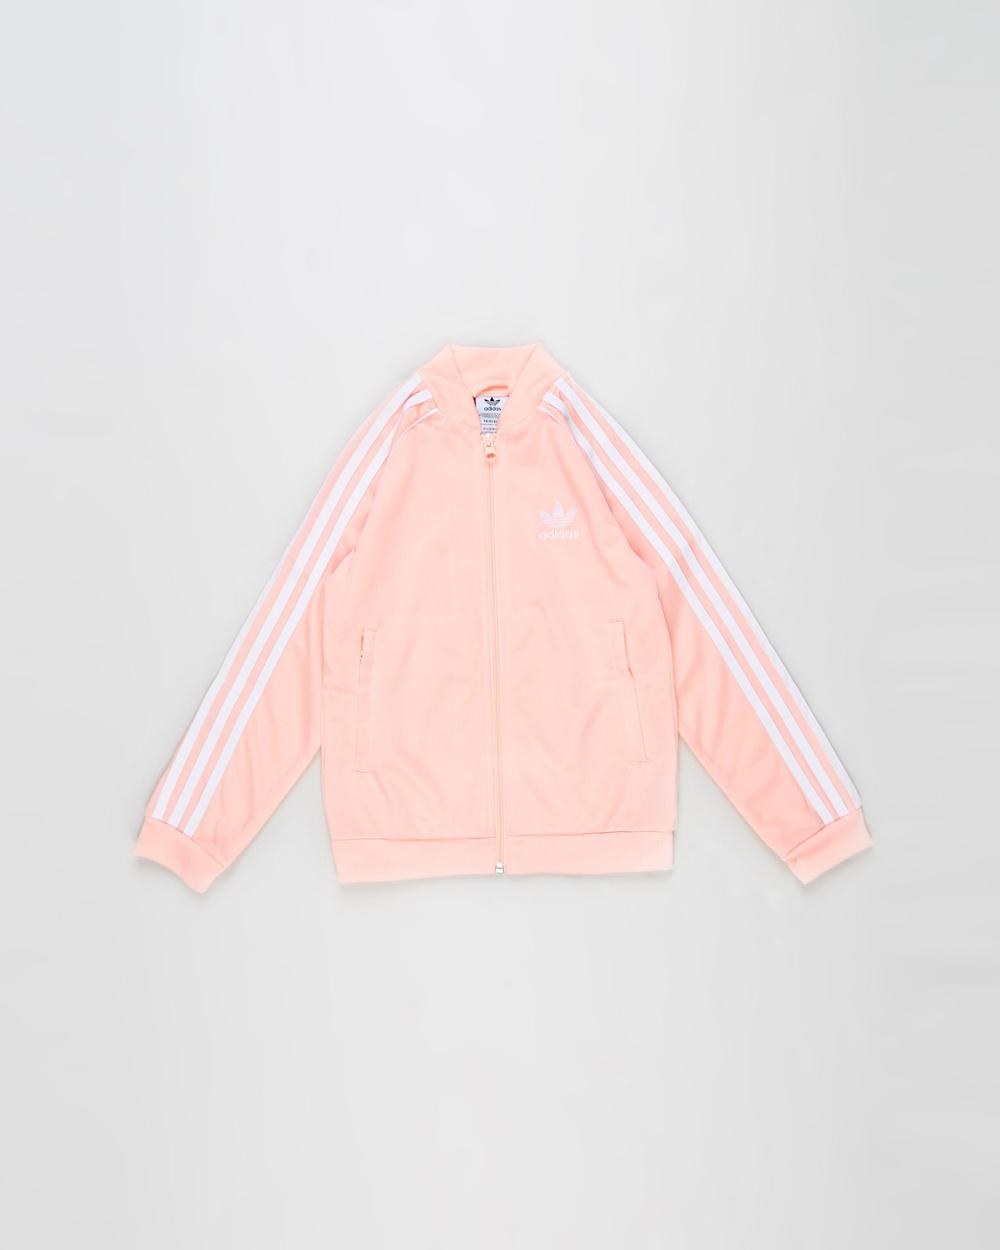 adidas Originals SST Track Top Kids Teens Coats & Jackets Haze Coral White Kids-Teens